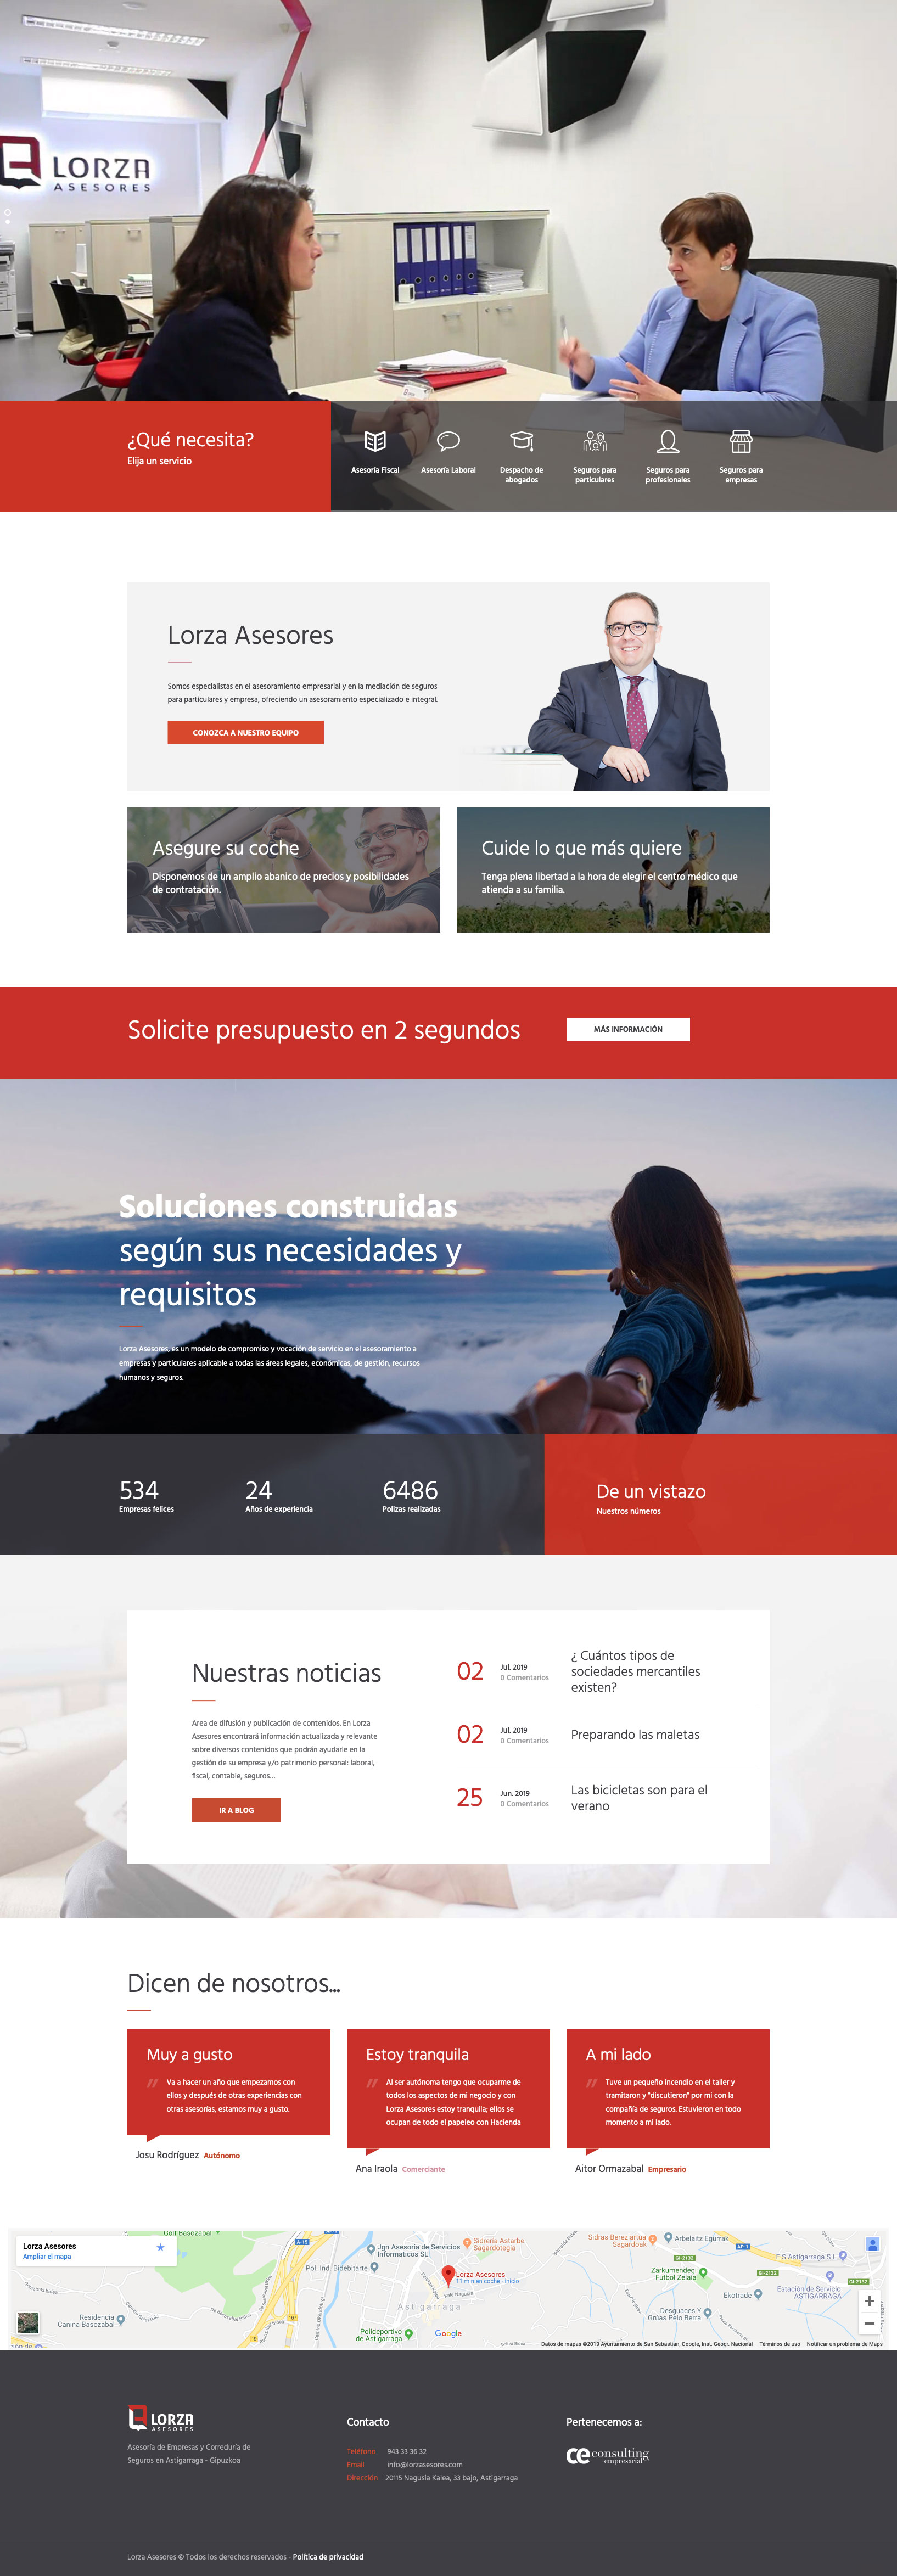 Lorza Asesores - Diseño Web 2